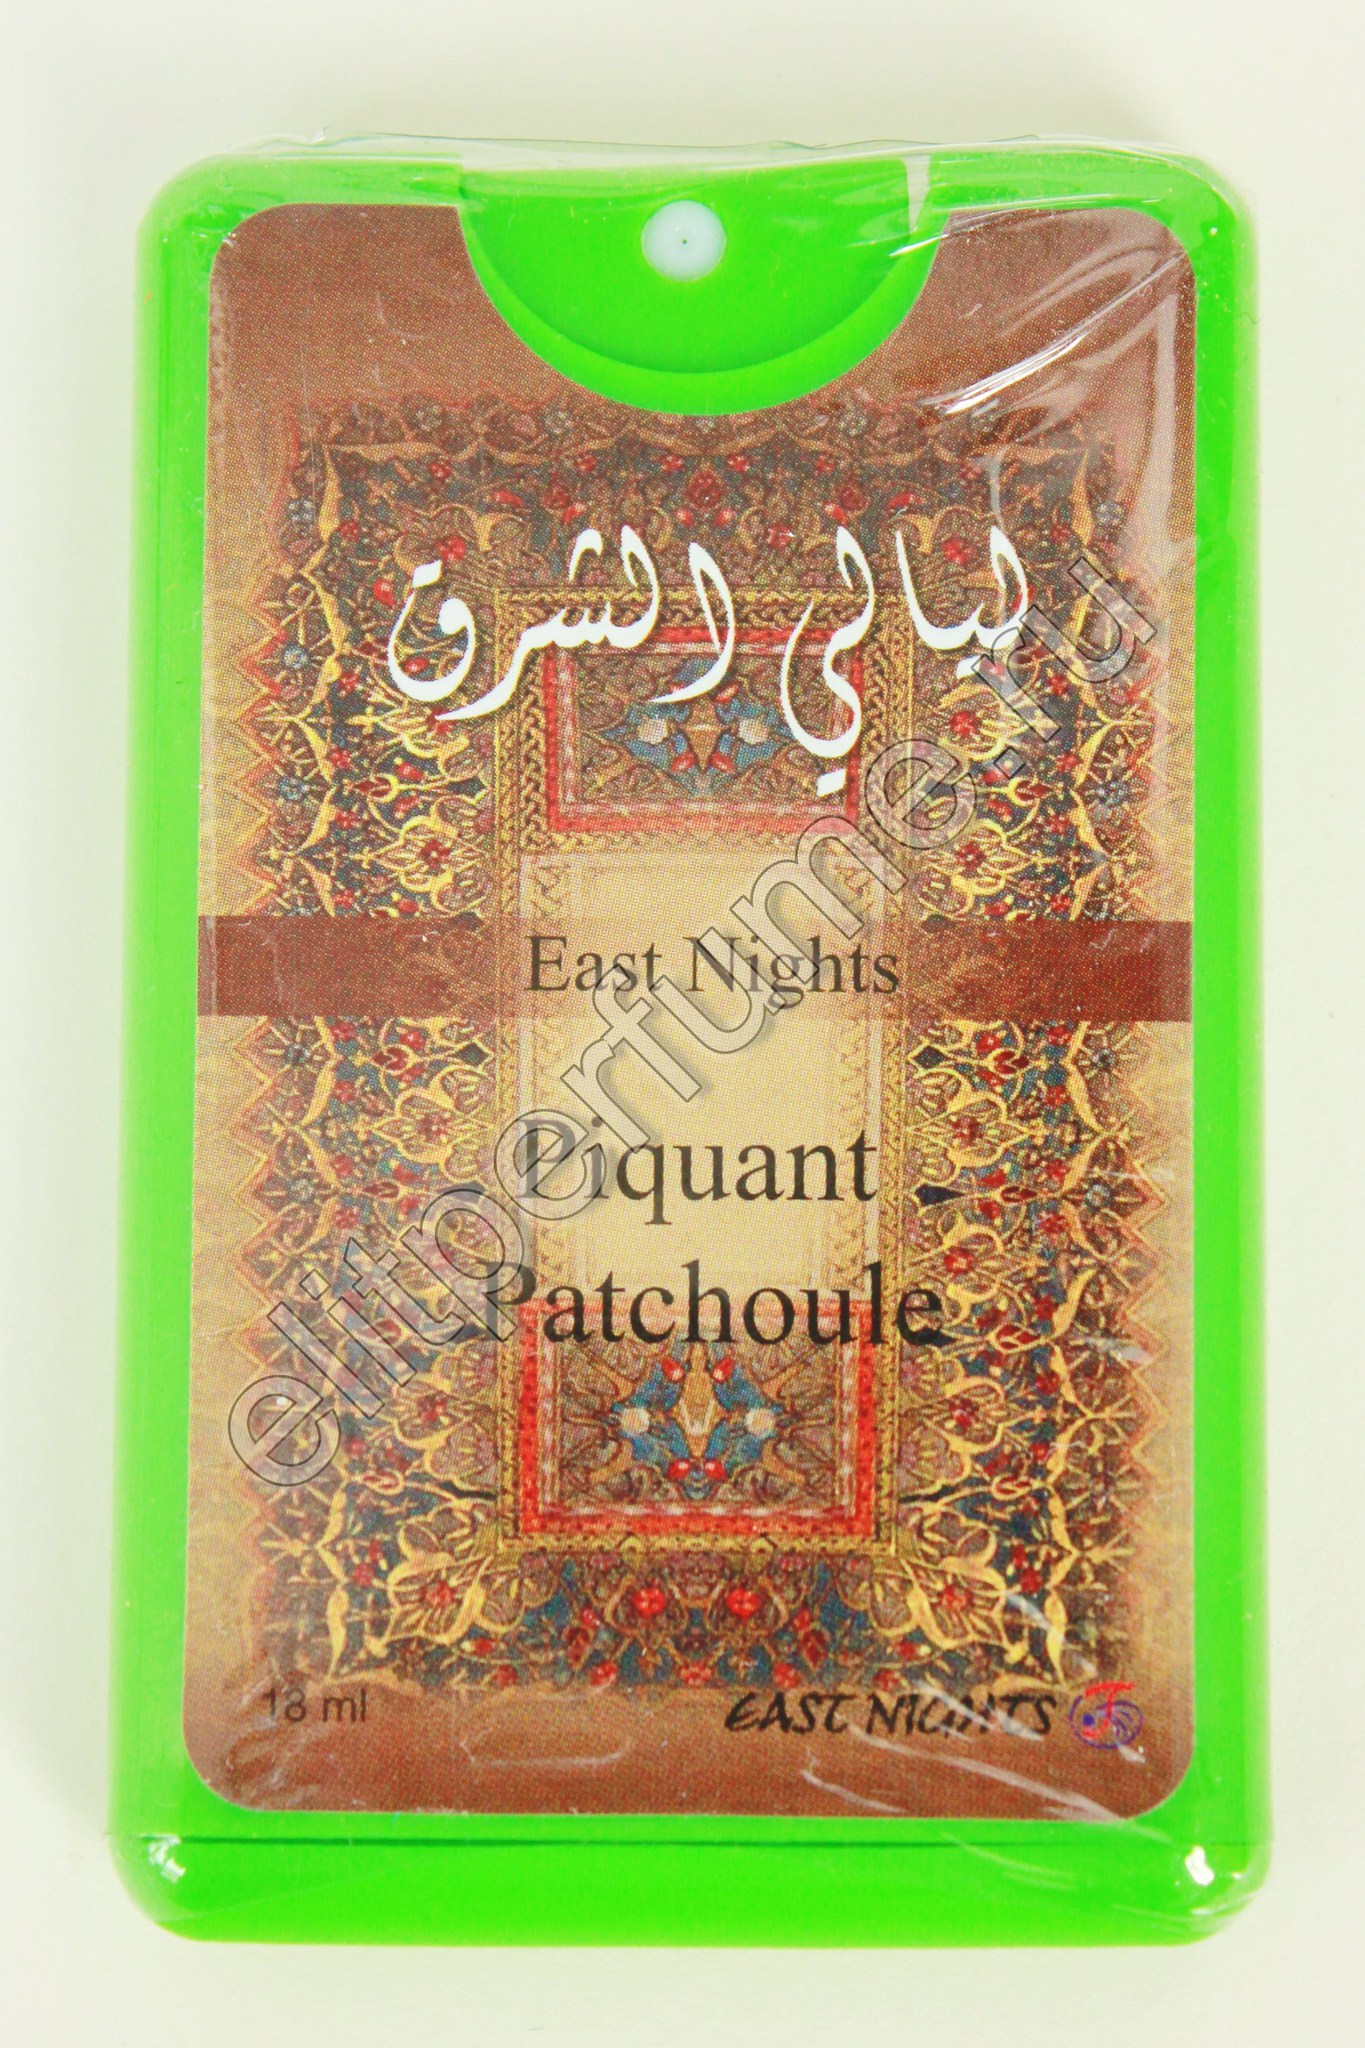 Piquant Patchoule натуральные масляные духи «Пикантные пачули» 18 мл